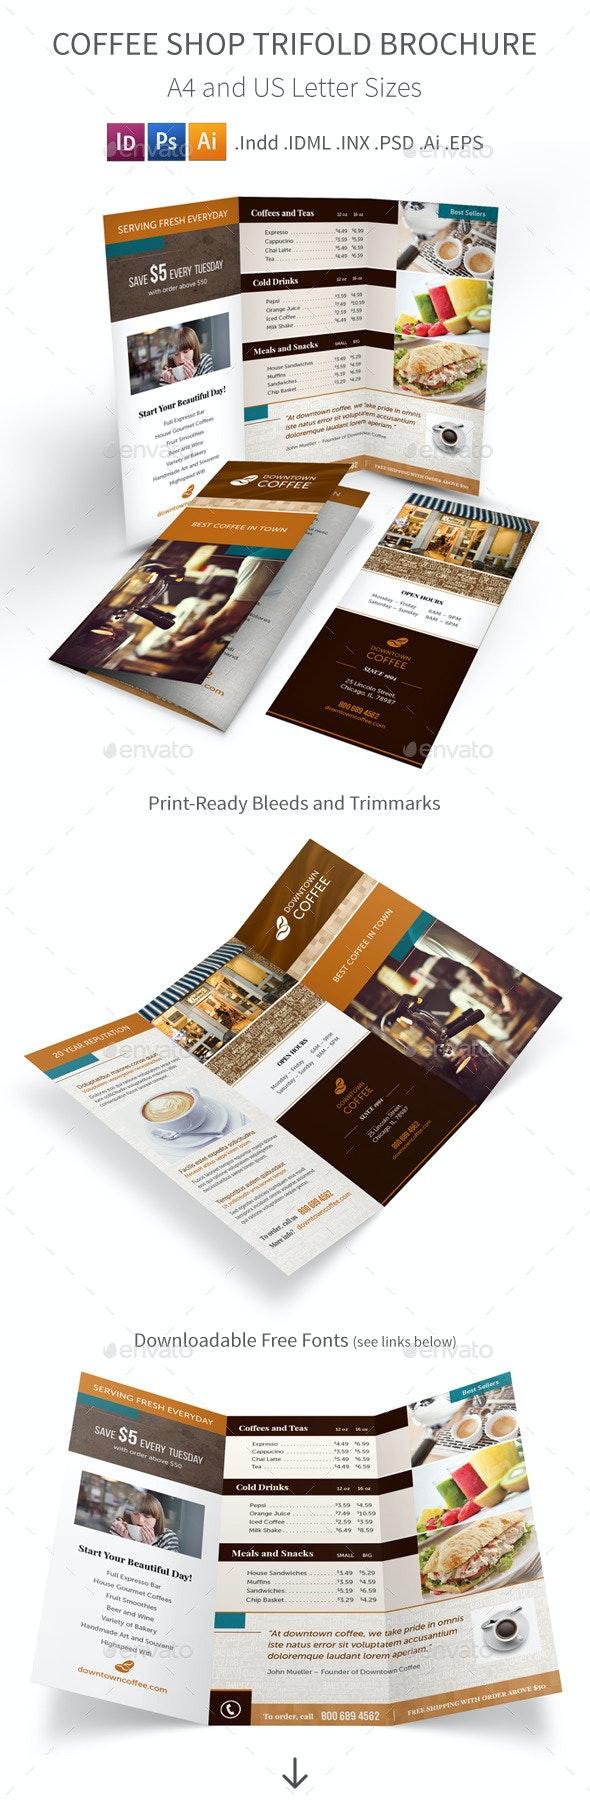 Coffee Shop Trifold Brochure - Informational Brochures